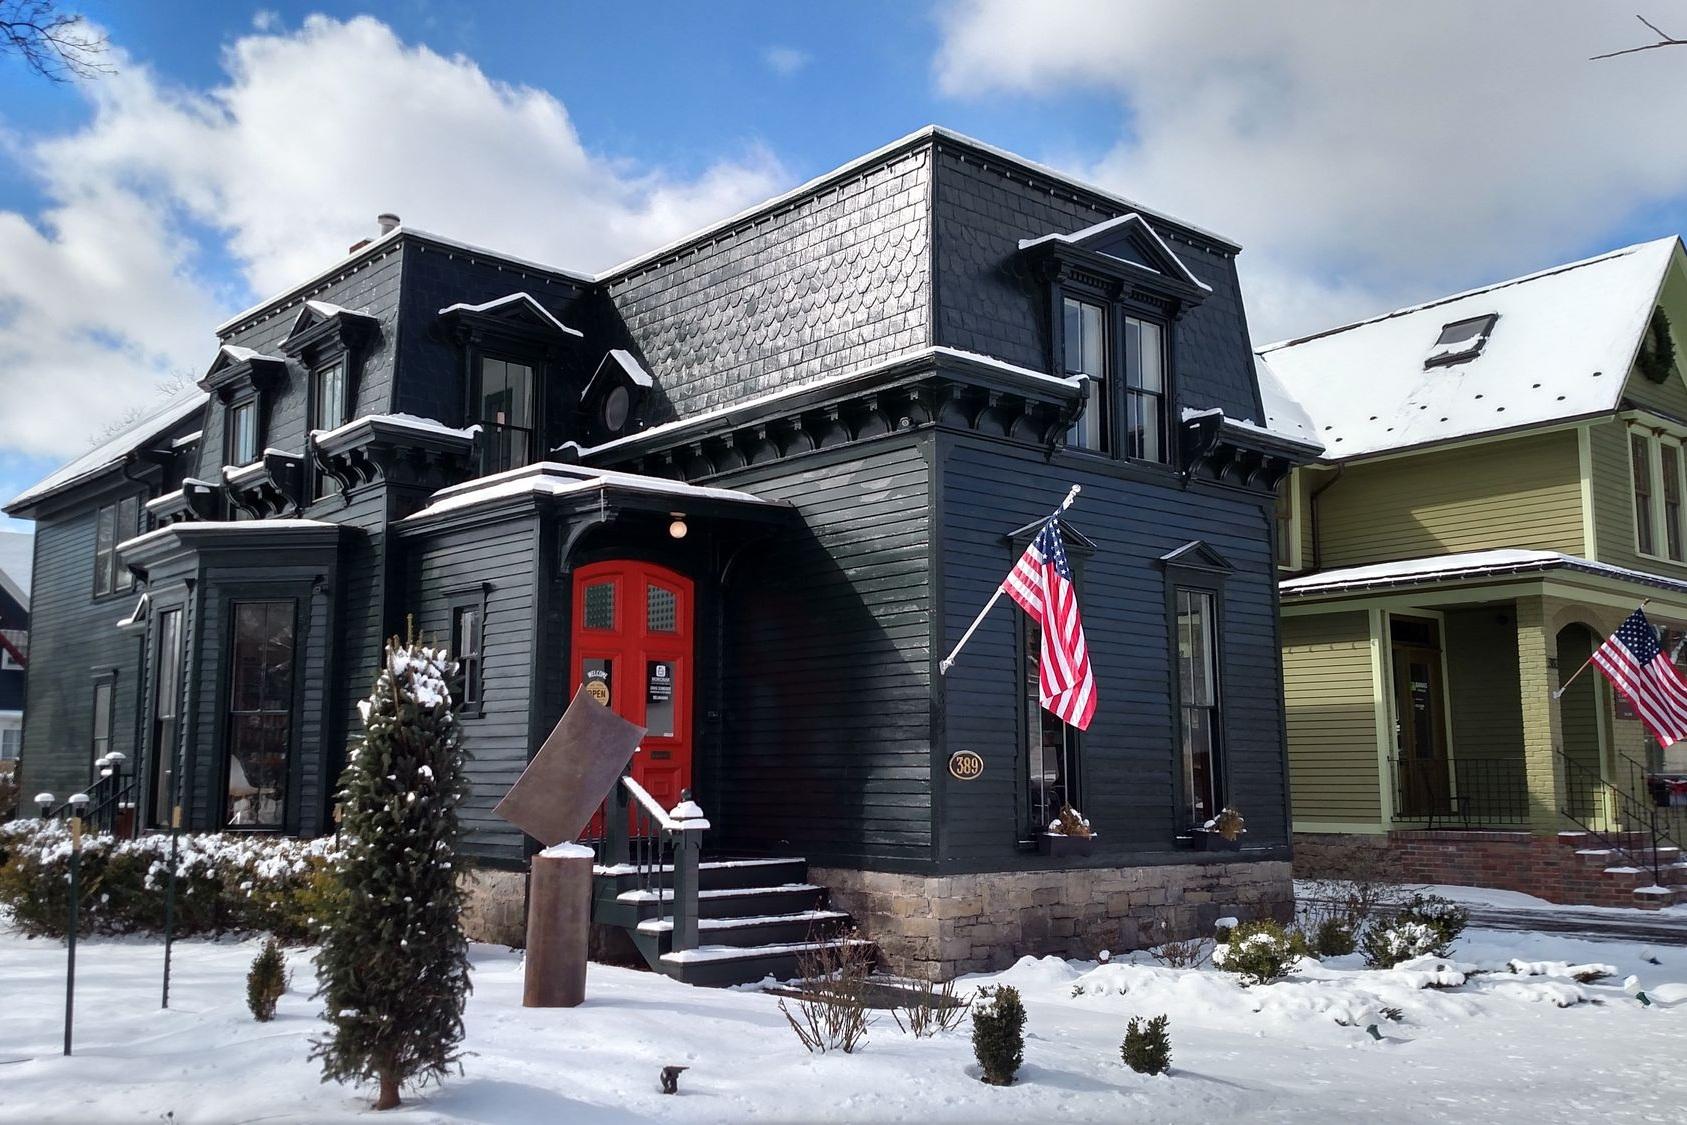 Rochester's Park Avenue Historic District